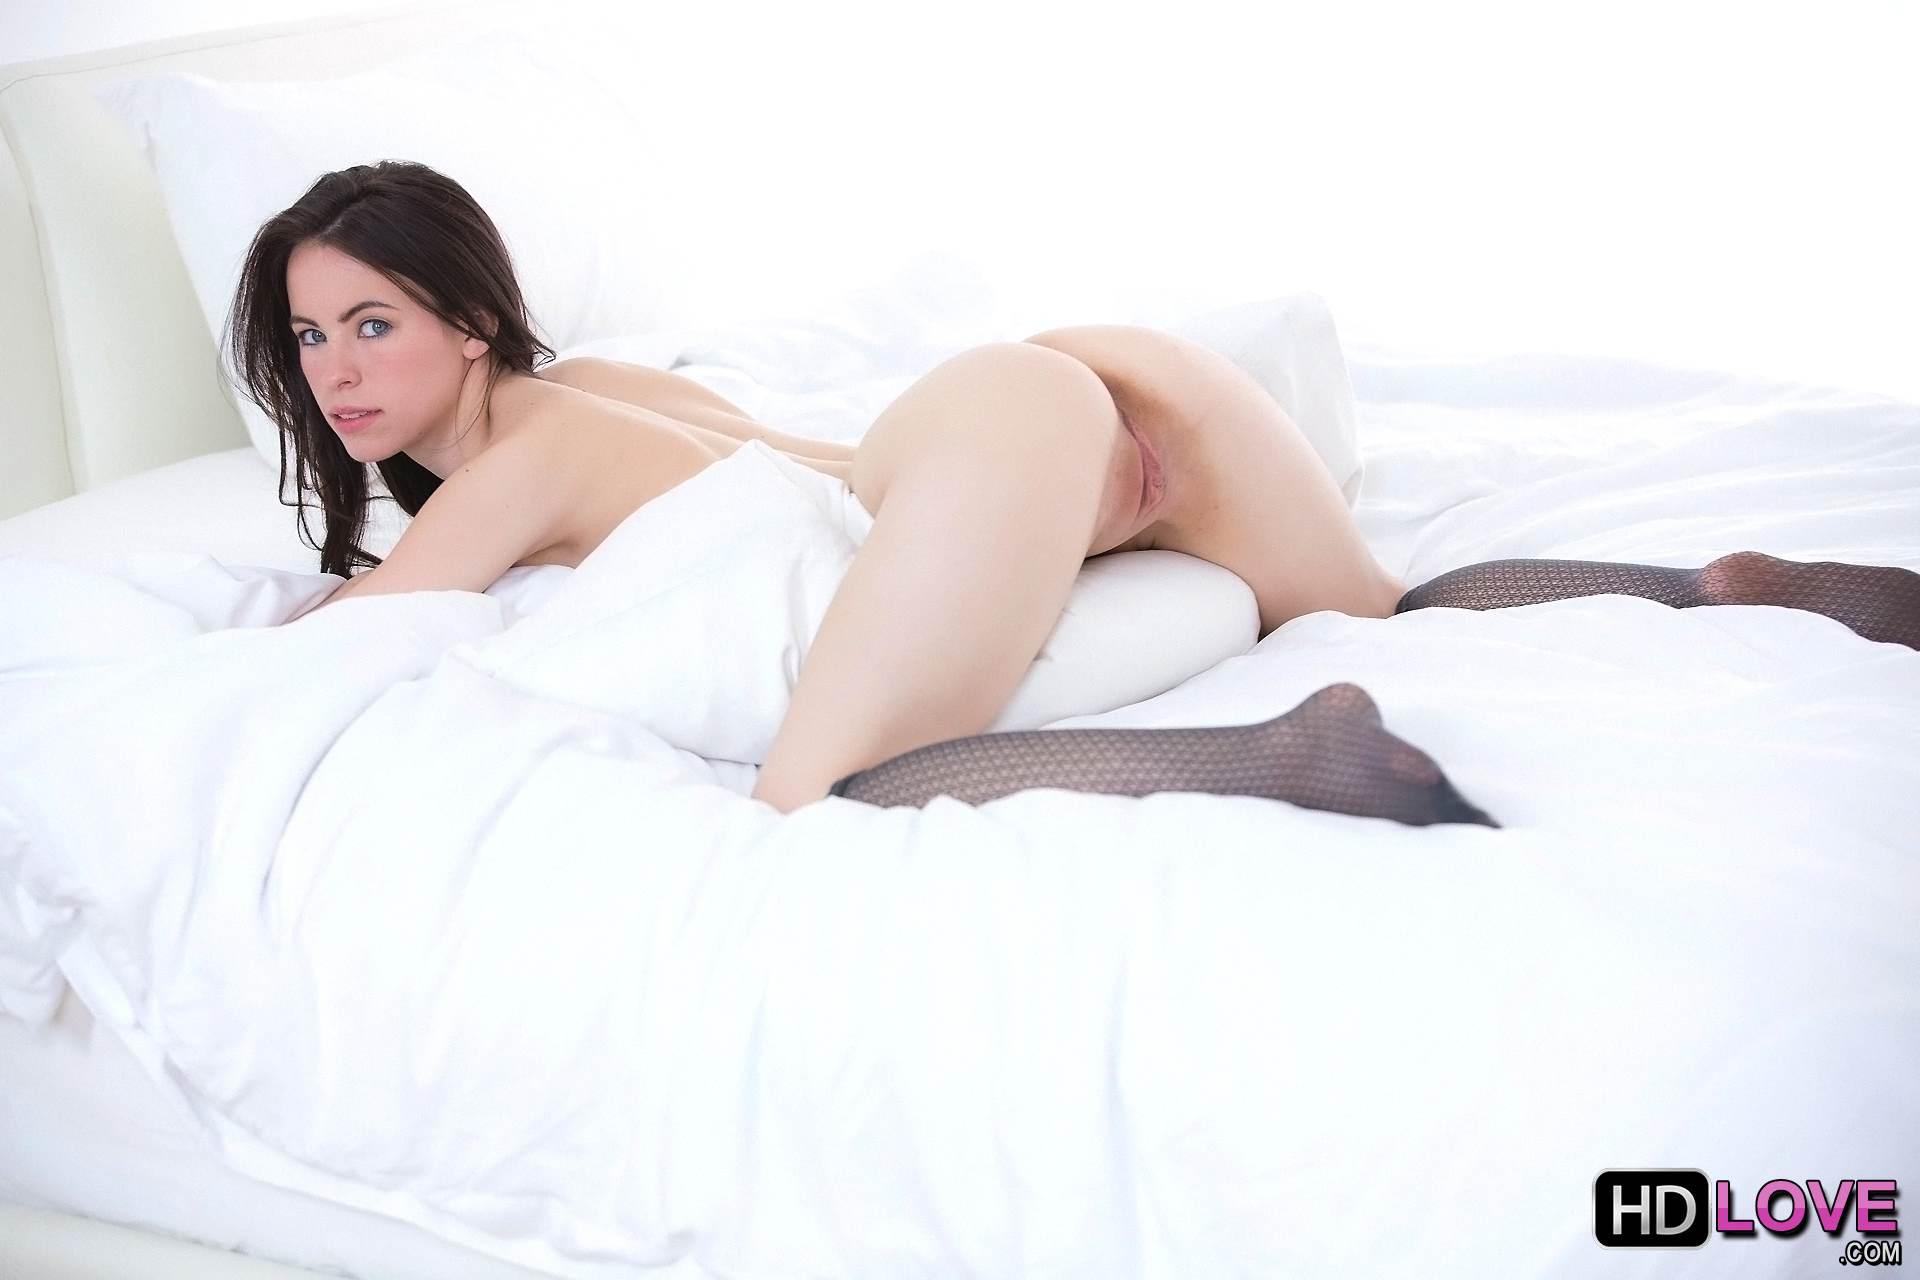 Julia Ann Porn  Popular Videos  Page 1  FOXPORNSCOM